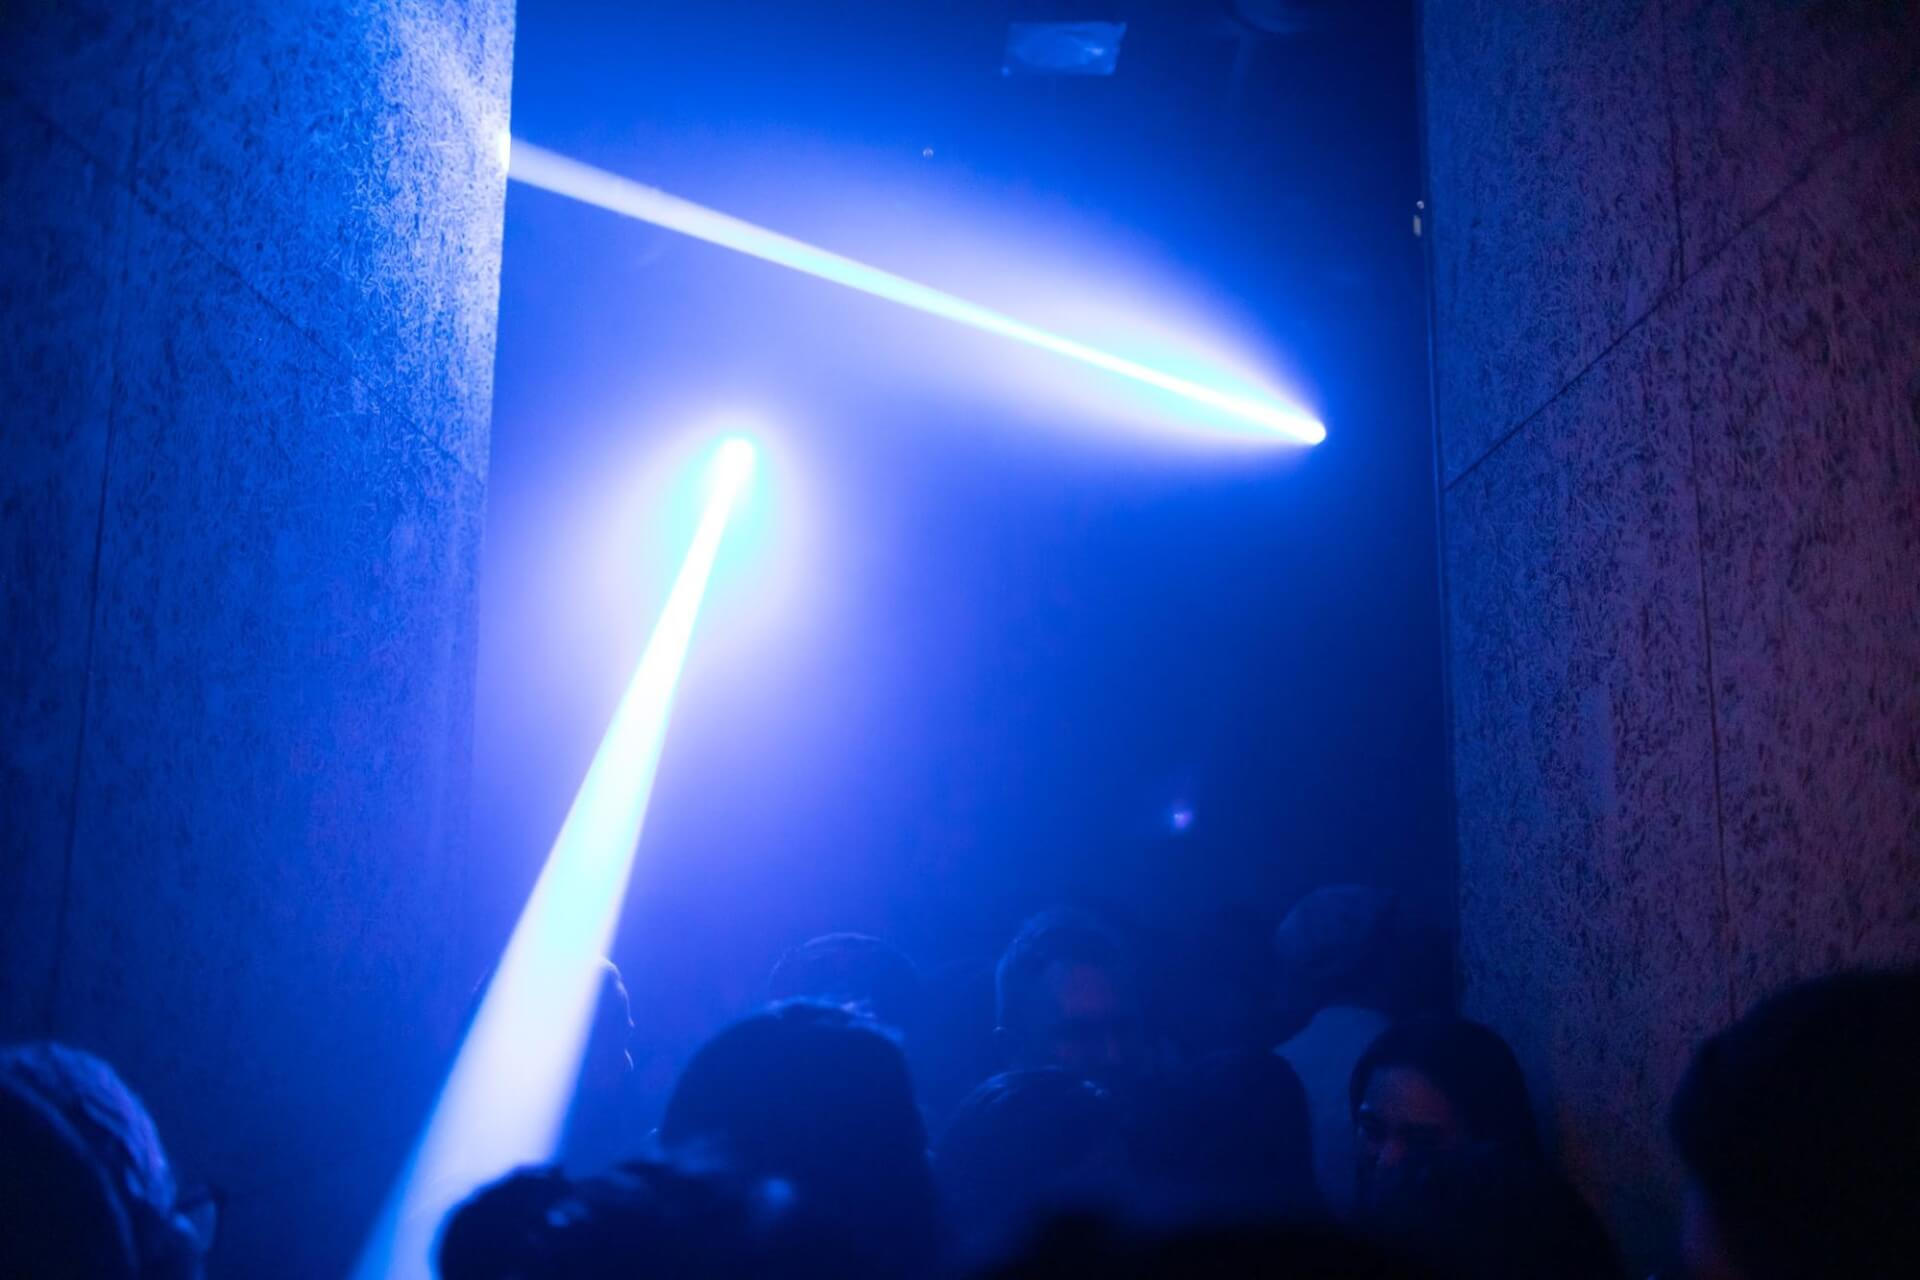 Floating Points at KEWL 2nd Anniversary Party。ダンスミュージックへの初期衝動を想い返した夜 music200116-kewl-floating-points-19